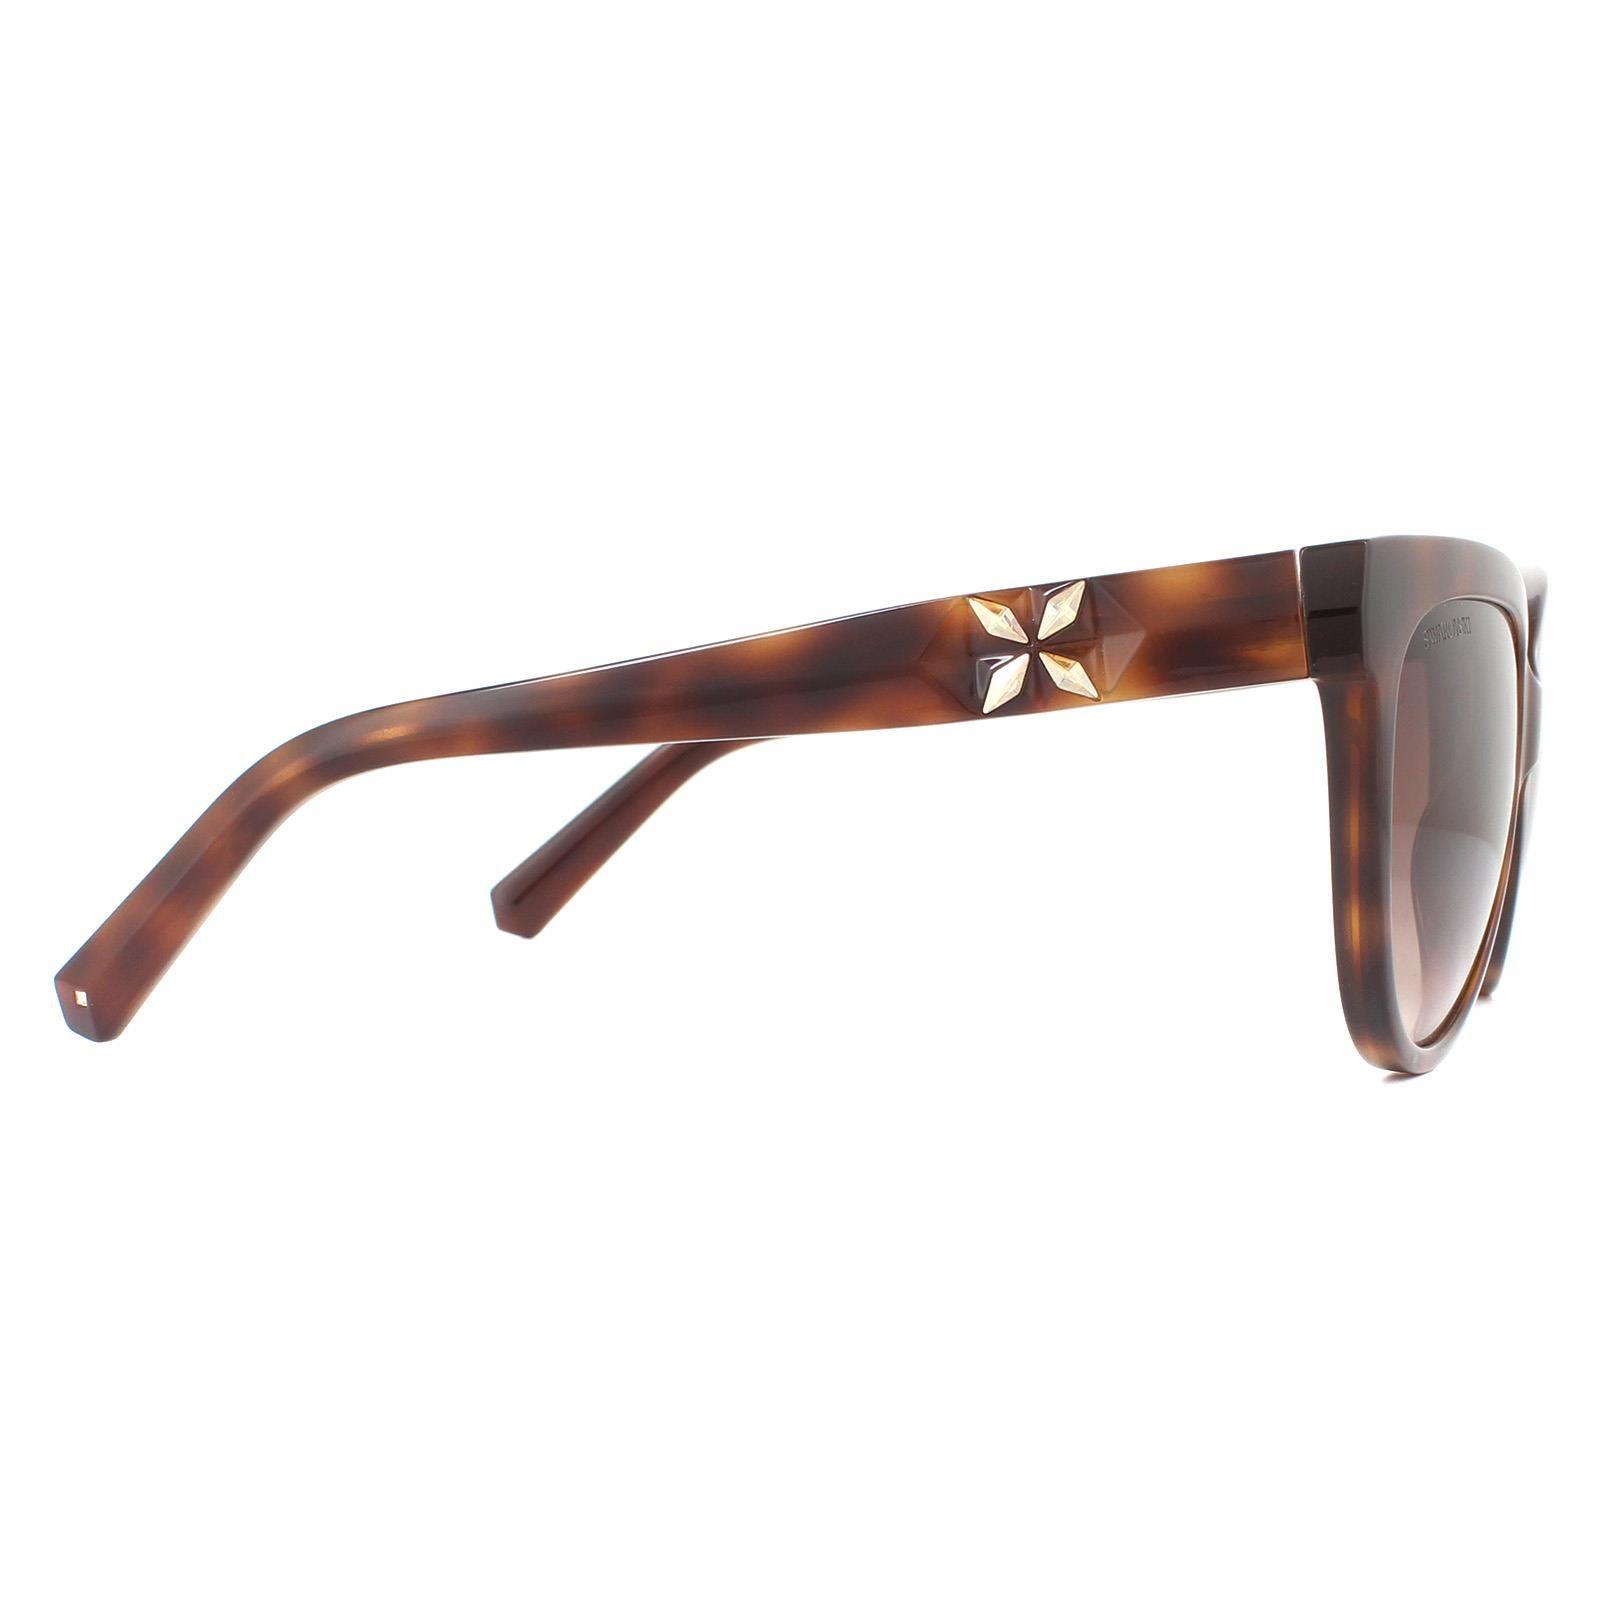 Swarovski Sunglasses SK0187 52F Dark Havana Brown Gradient